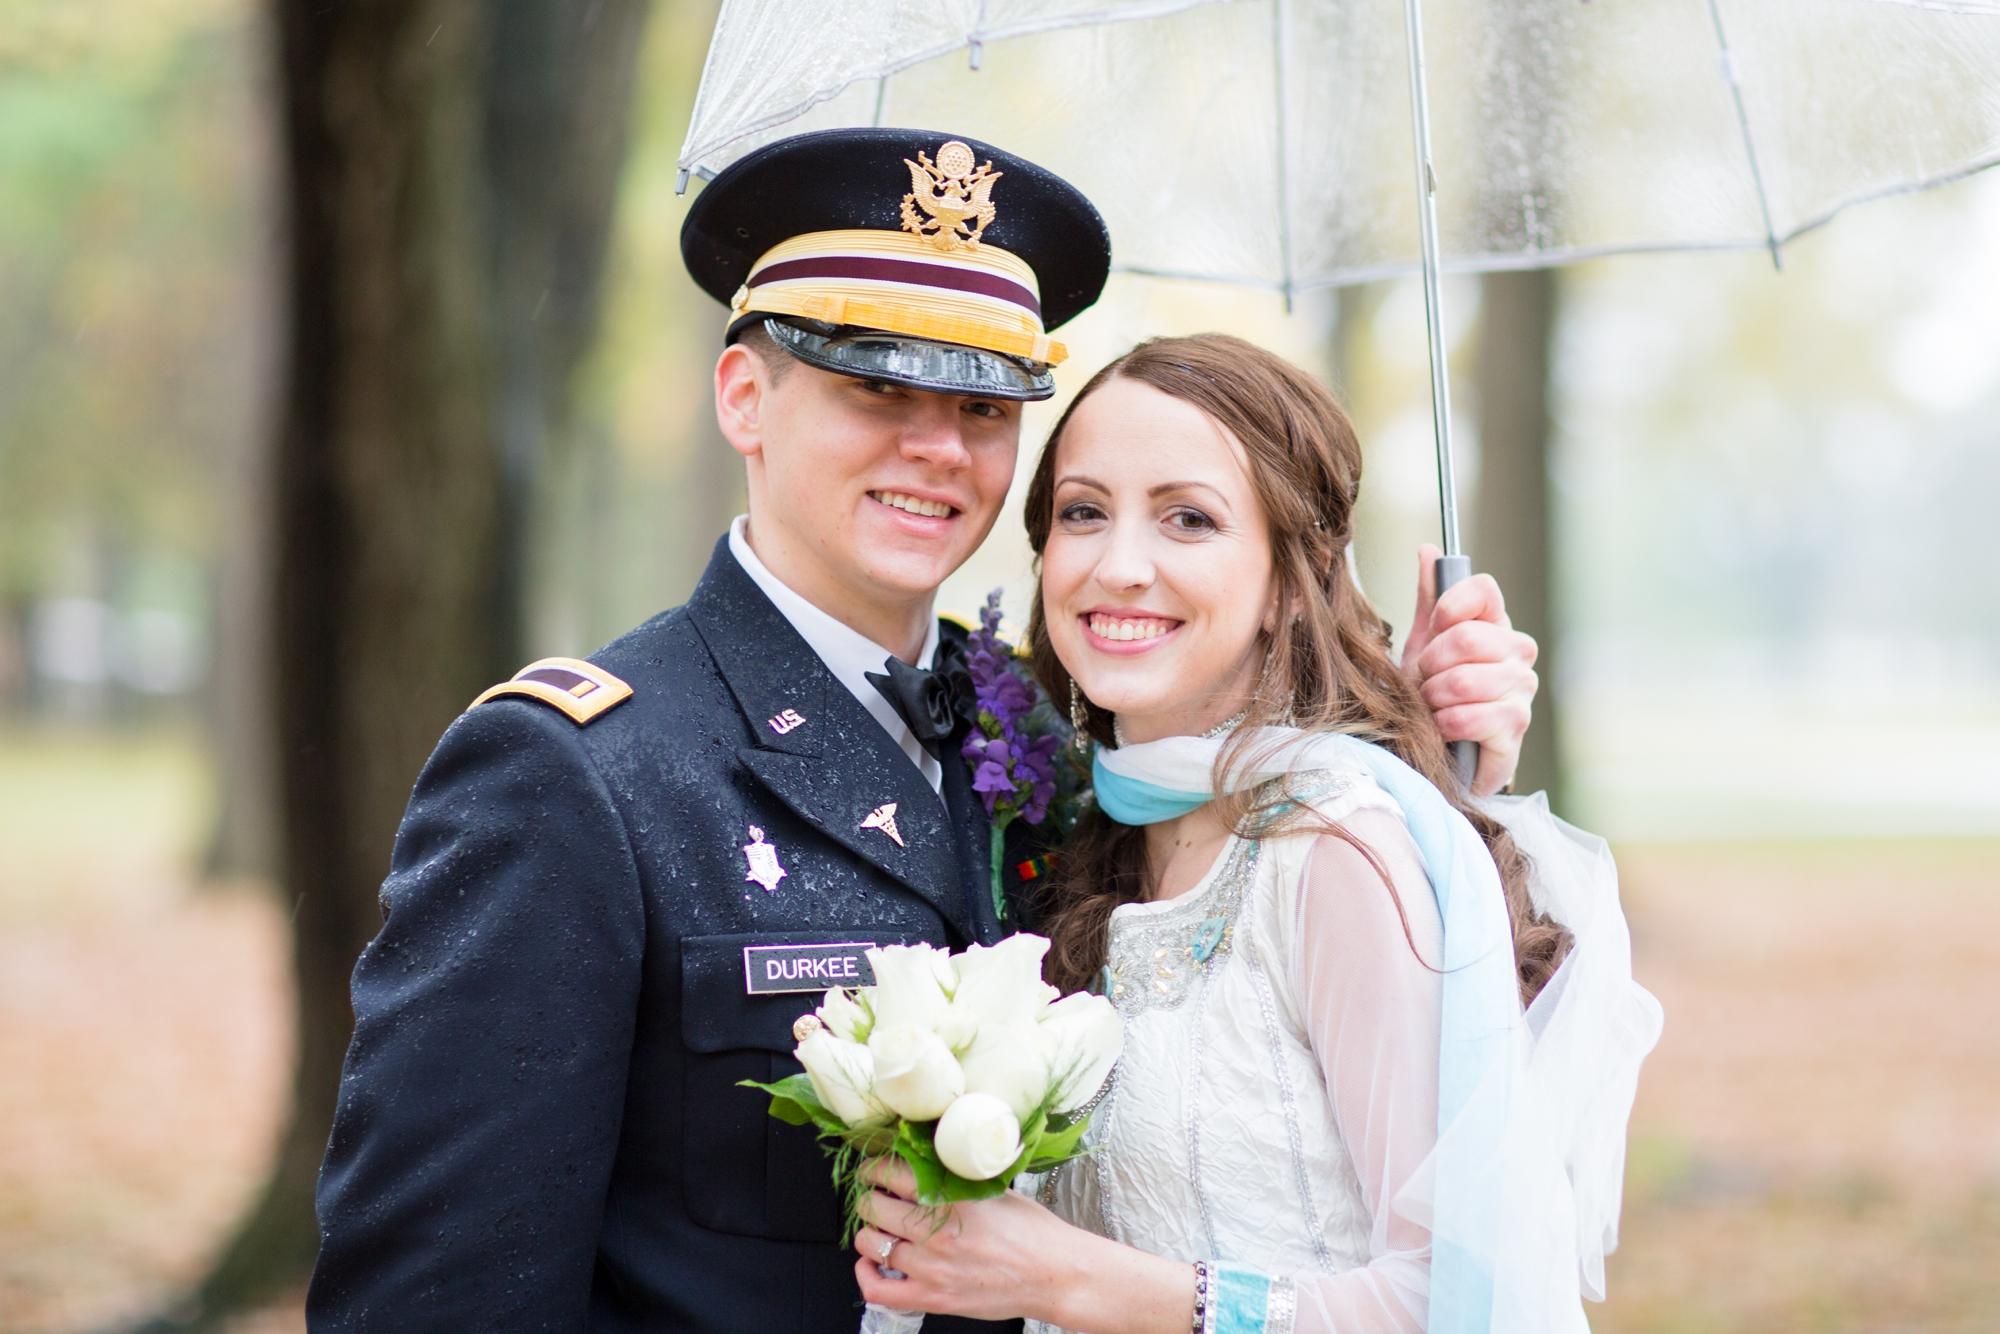 2. Durkee Wedding Bride & Groom Portraits-175_anna grace photography virginia wedding photographer dc war memorial washington dc photo.jpg